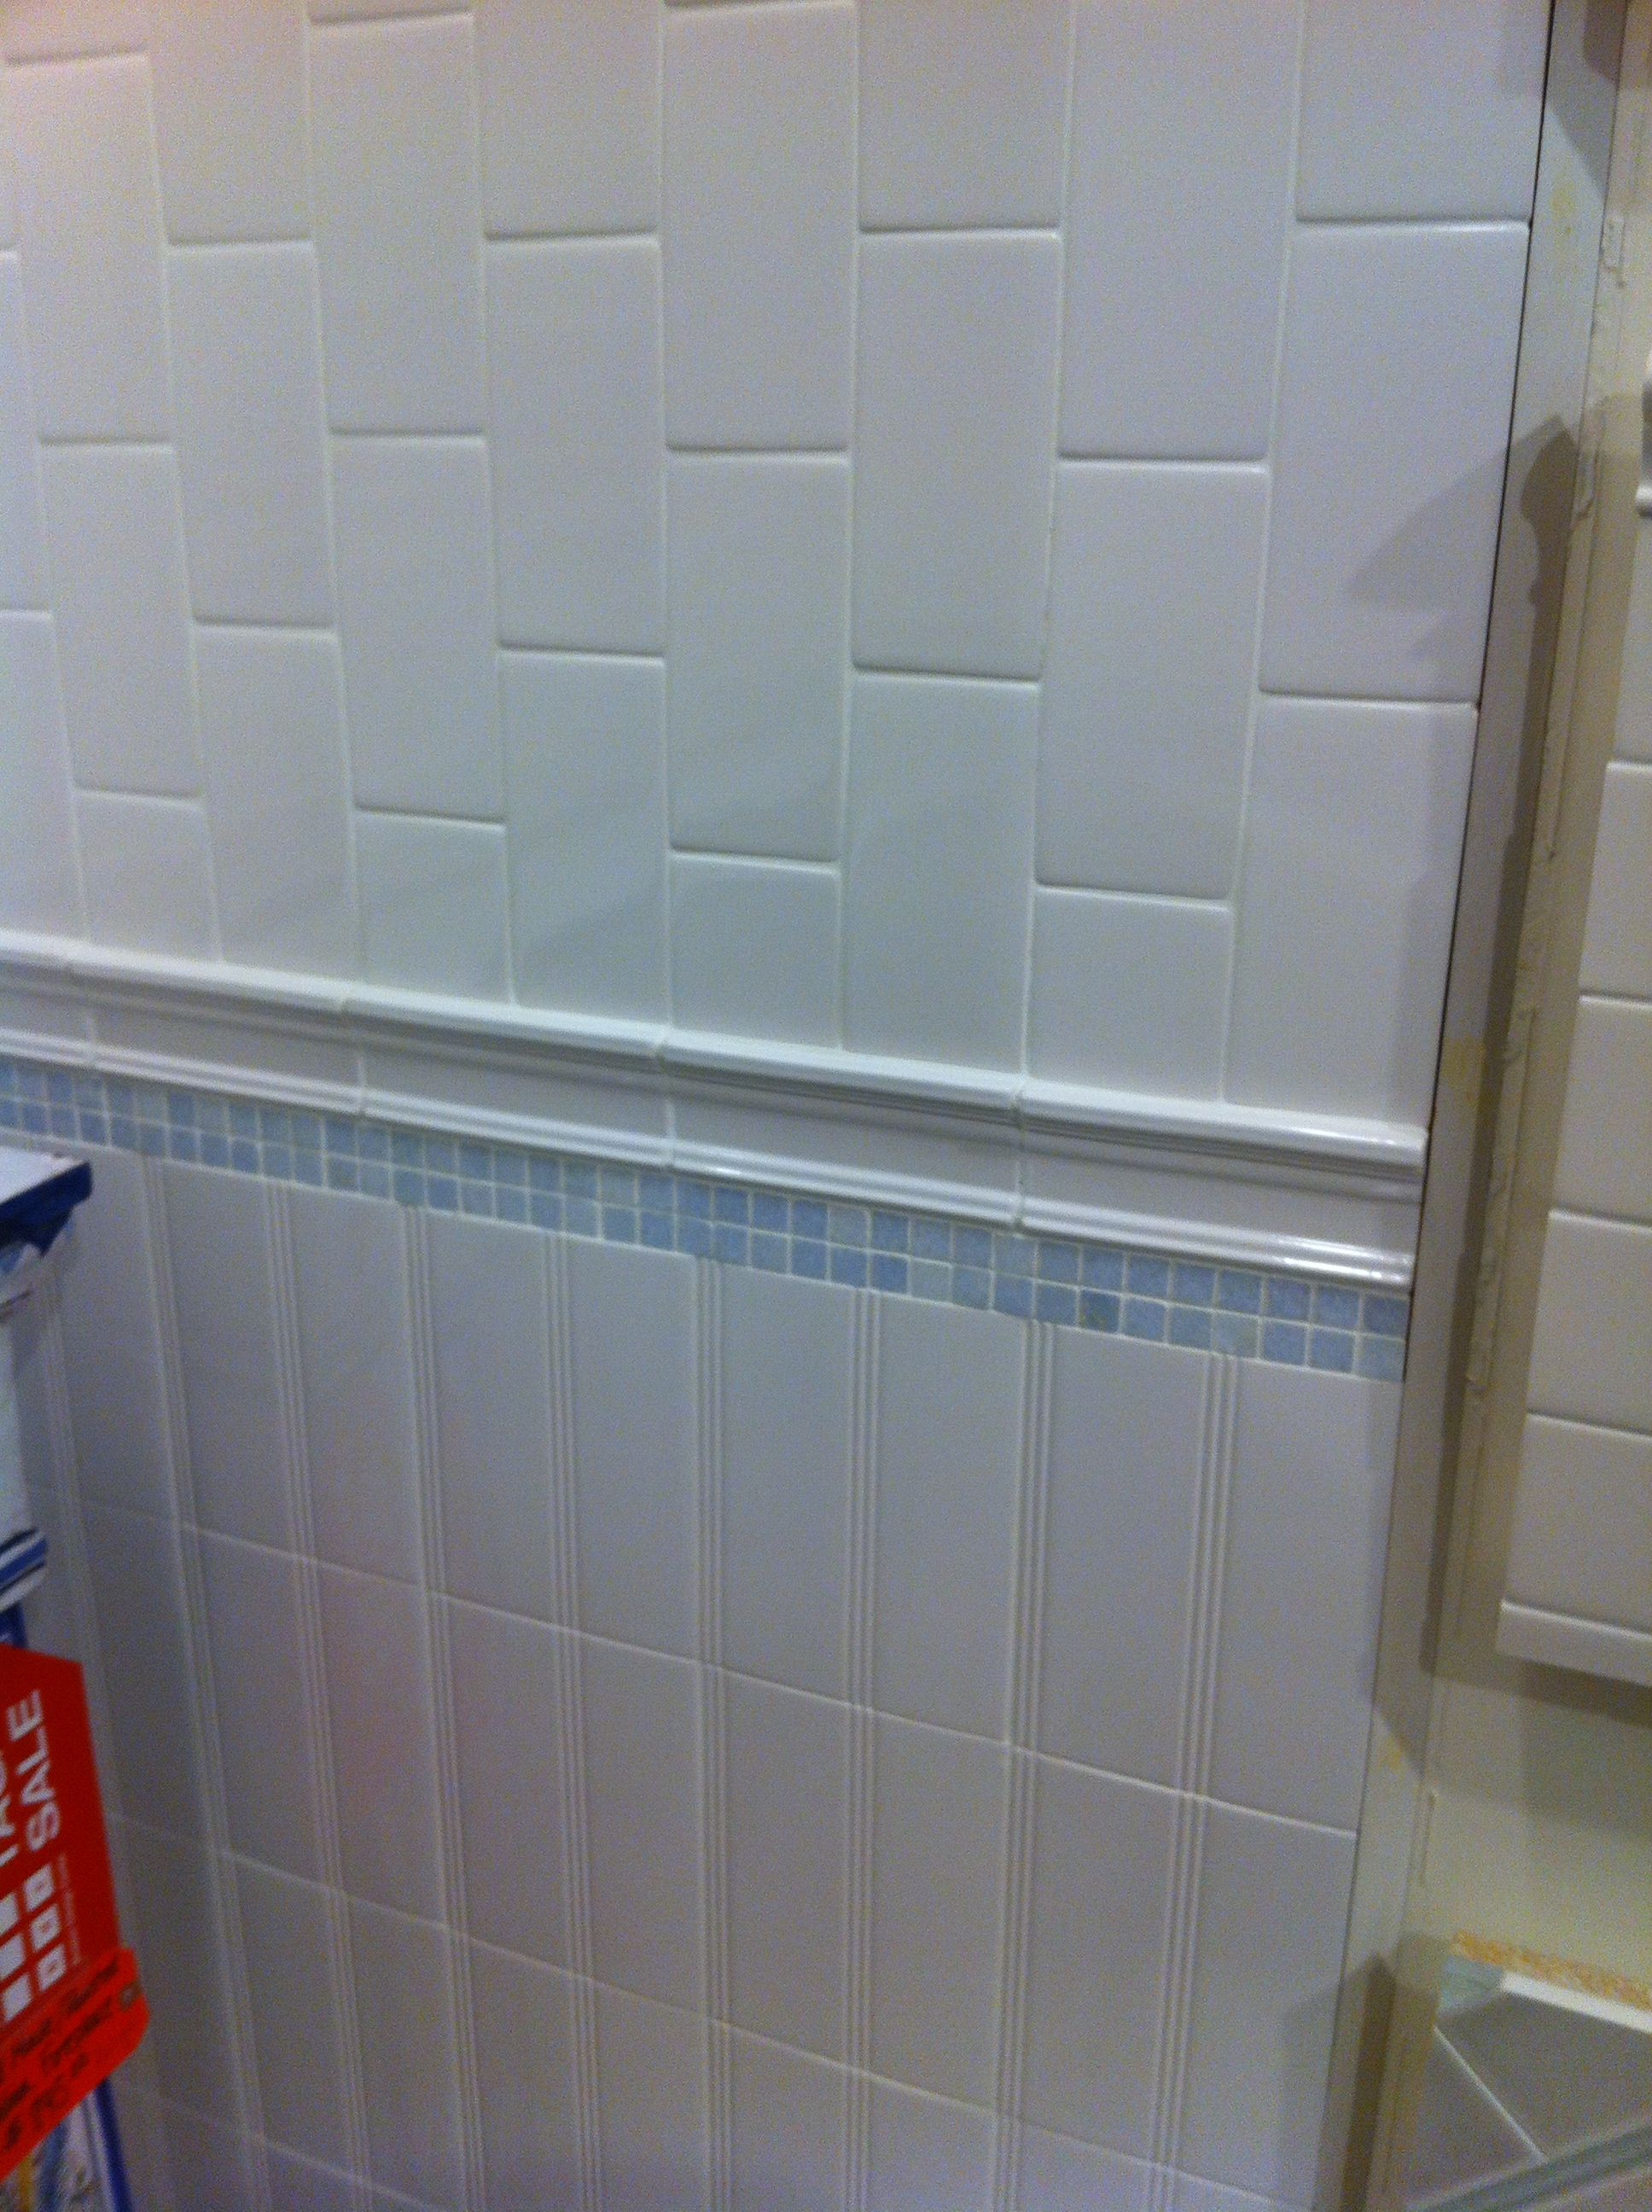 Tile pattern | Architectural Details | Pinterest | Tile patterns ...